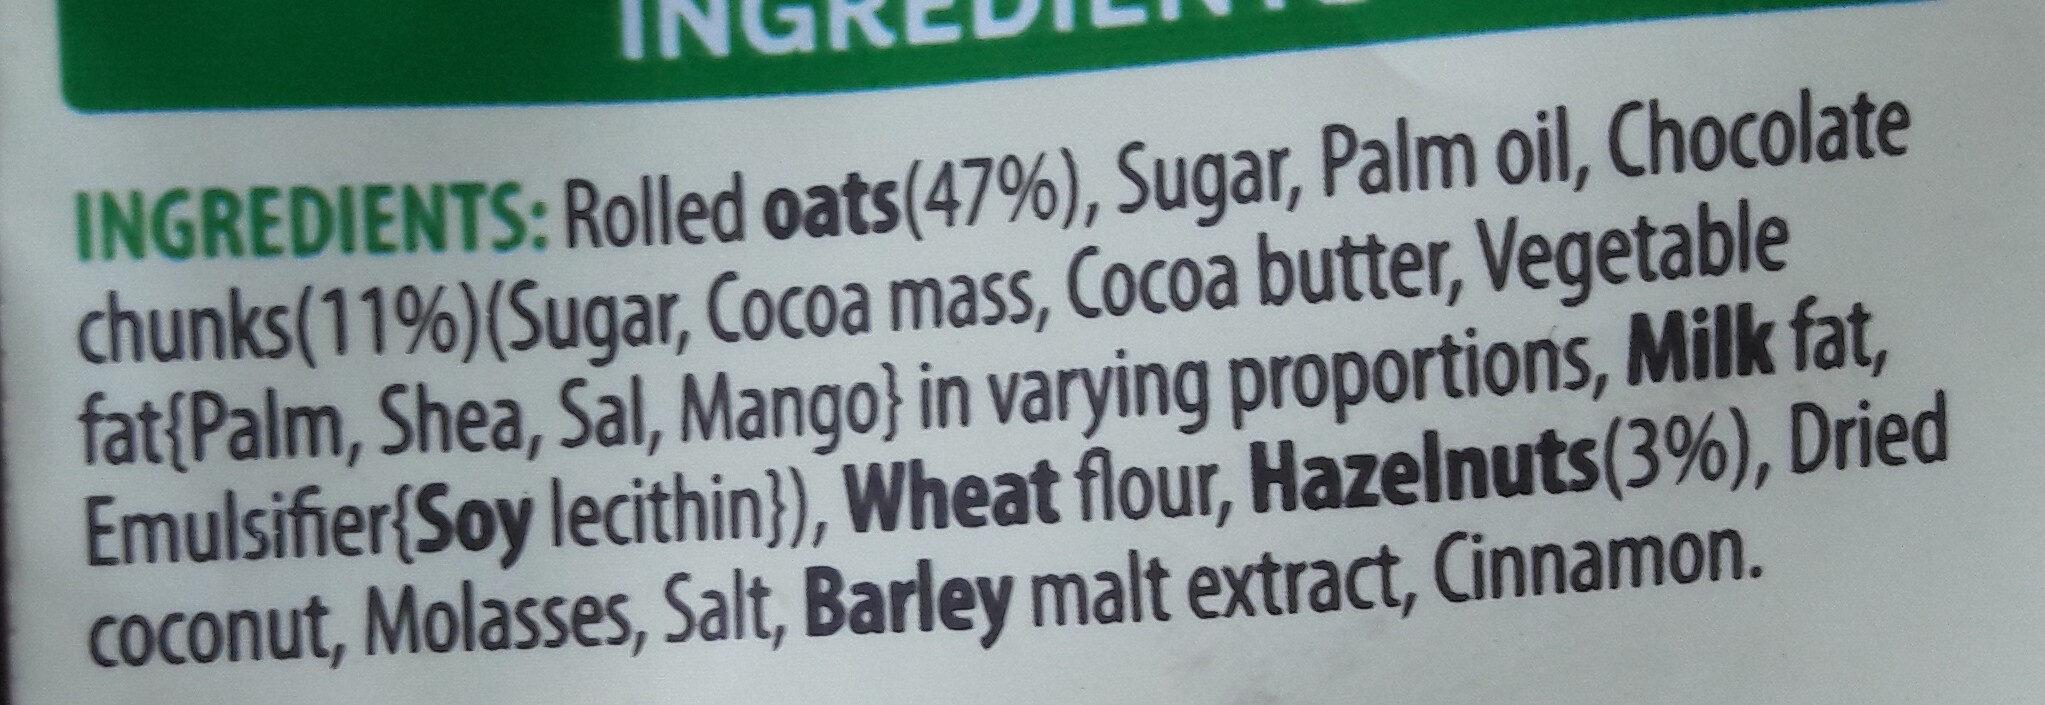 Crunchy Nut - Glorious Oat Granola - Ingredients